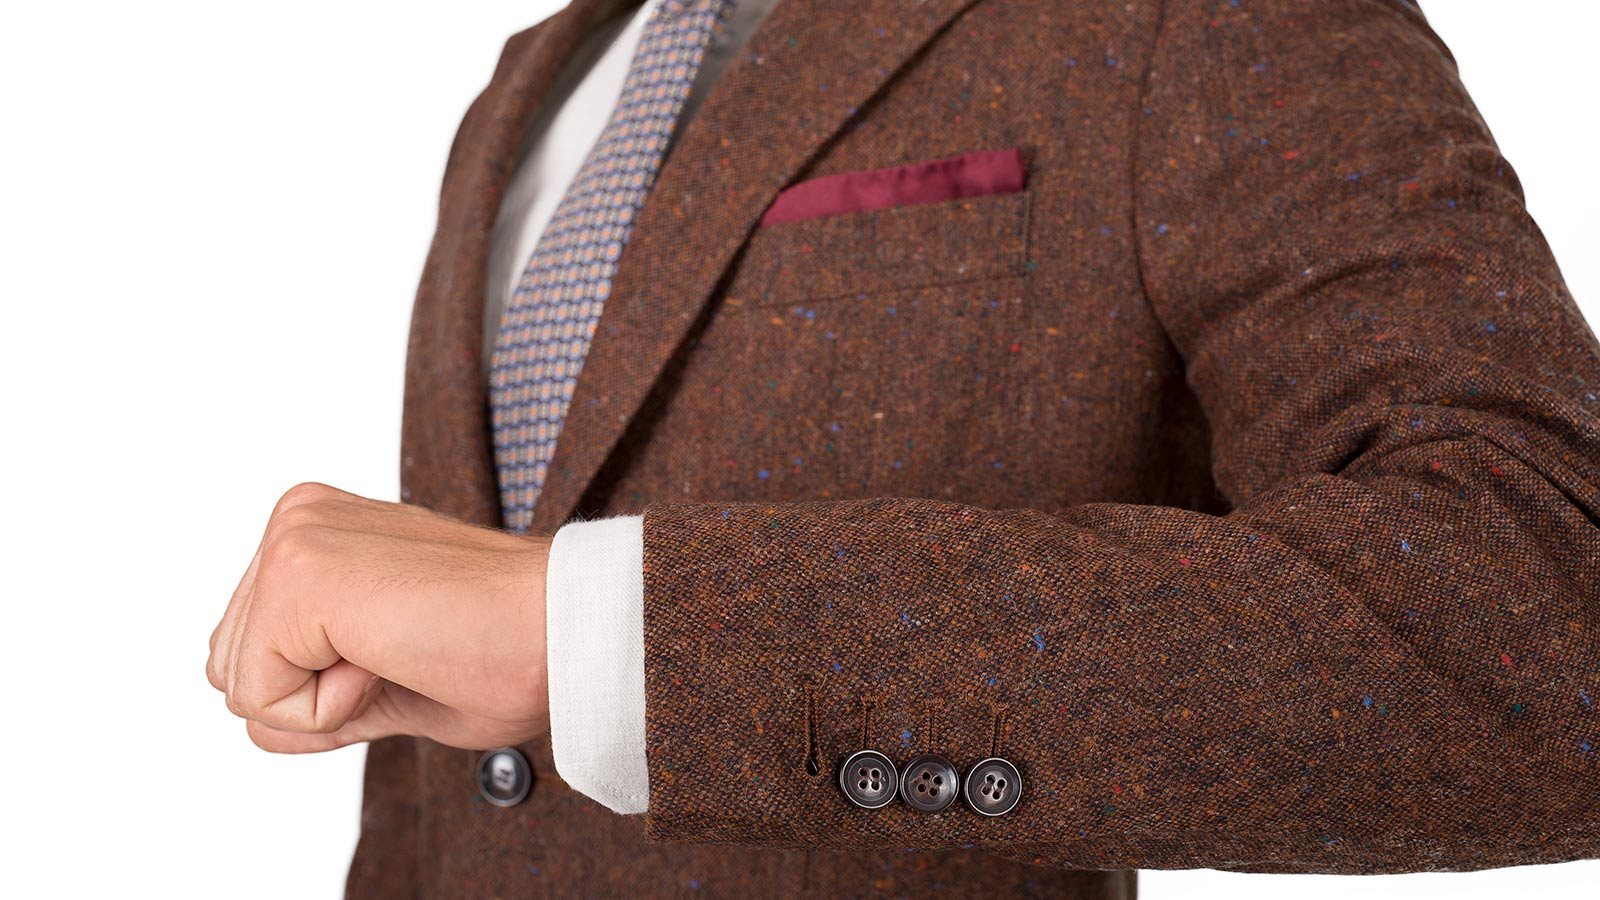 Copper Brown Donegal Tweed Suit - slider image 1